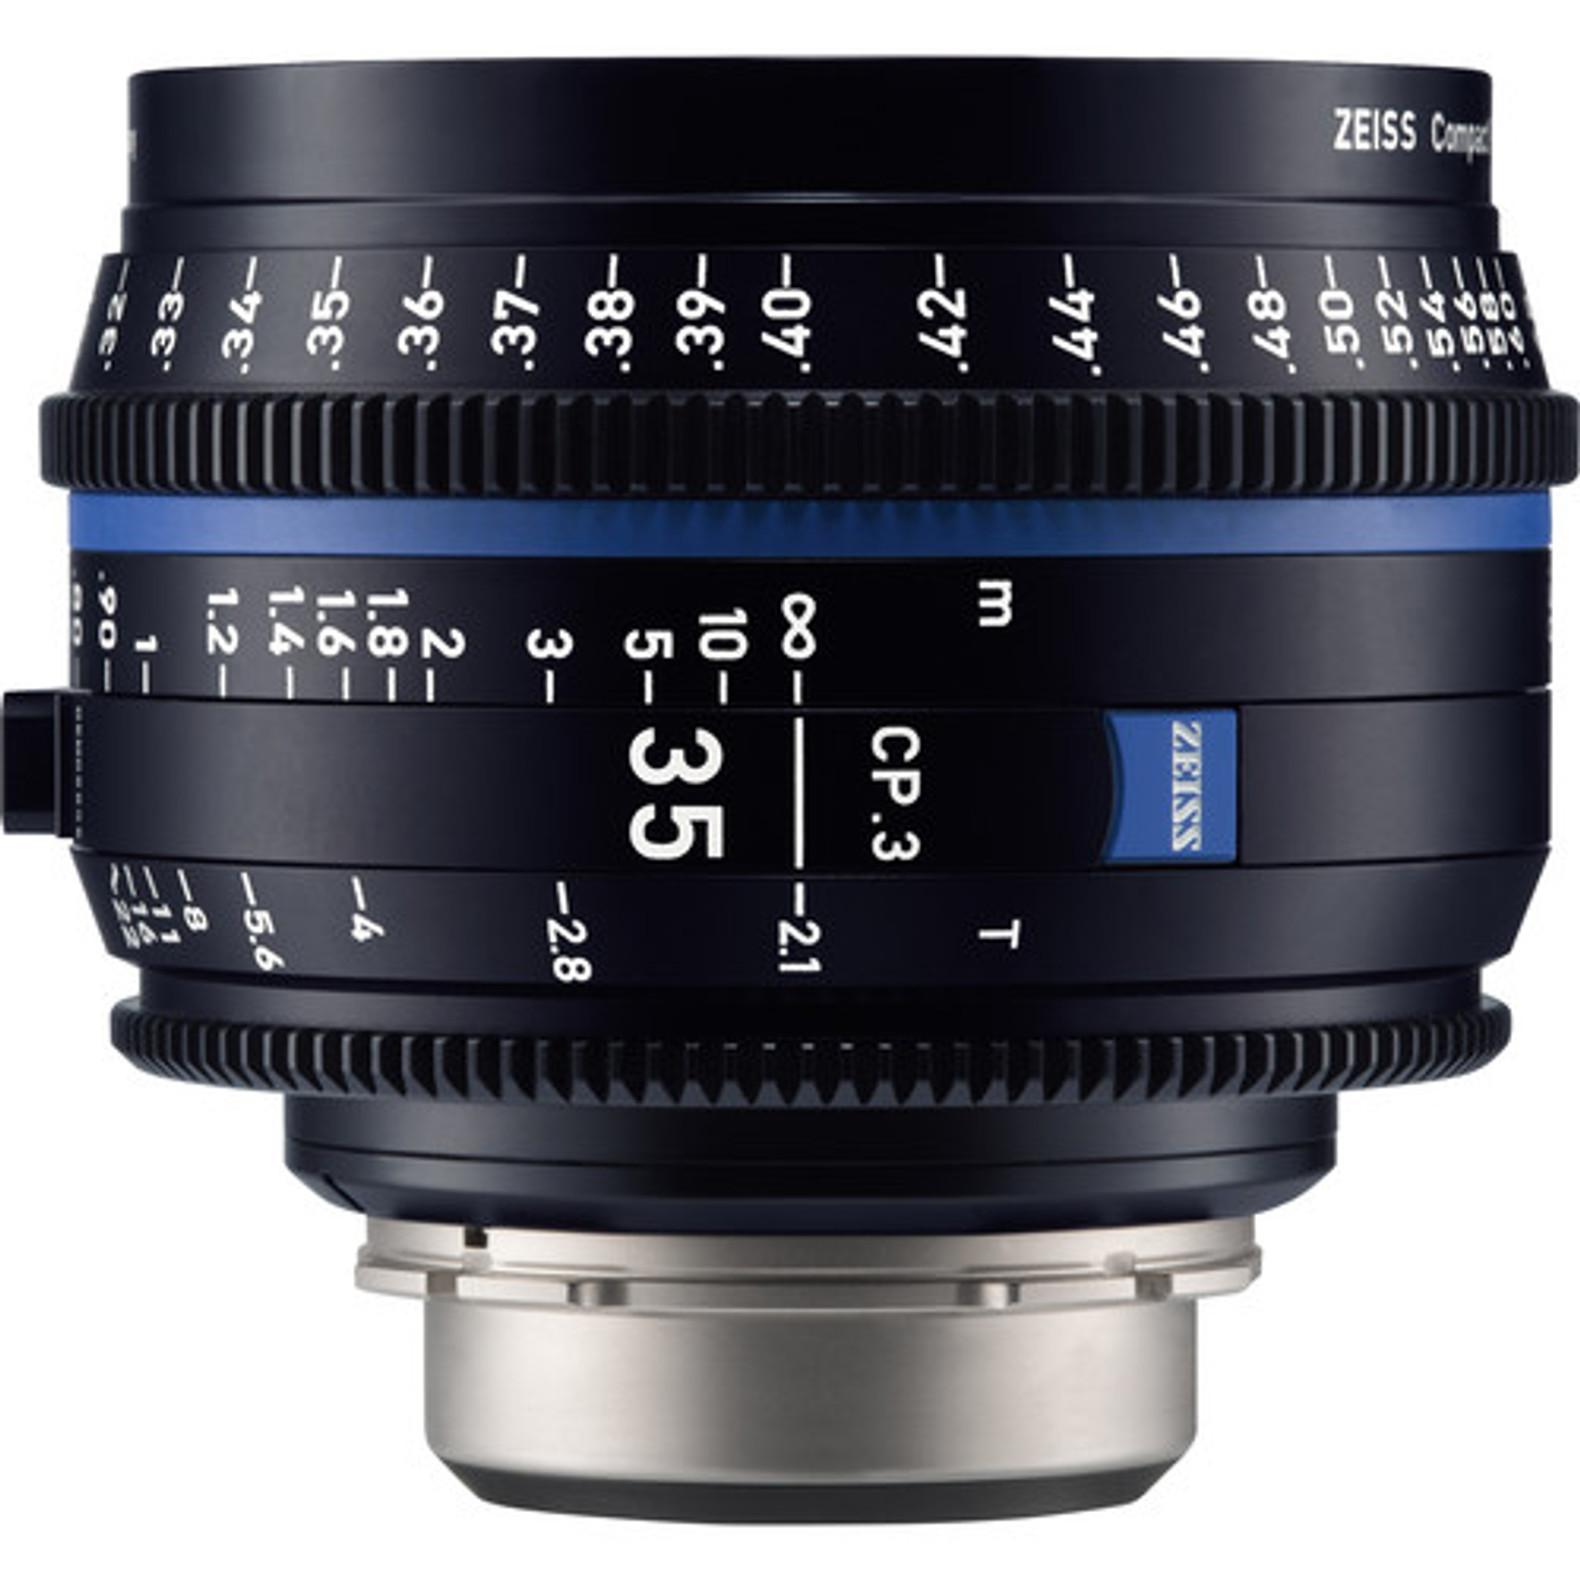 Zeiss CP 3 35mm T2 1 Compact Prime Lens (Nikon F Mount)